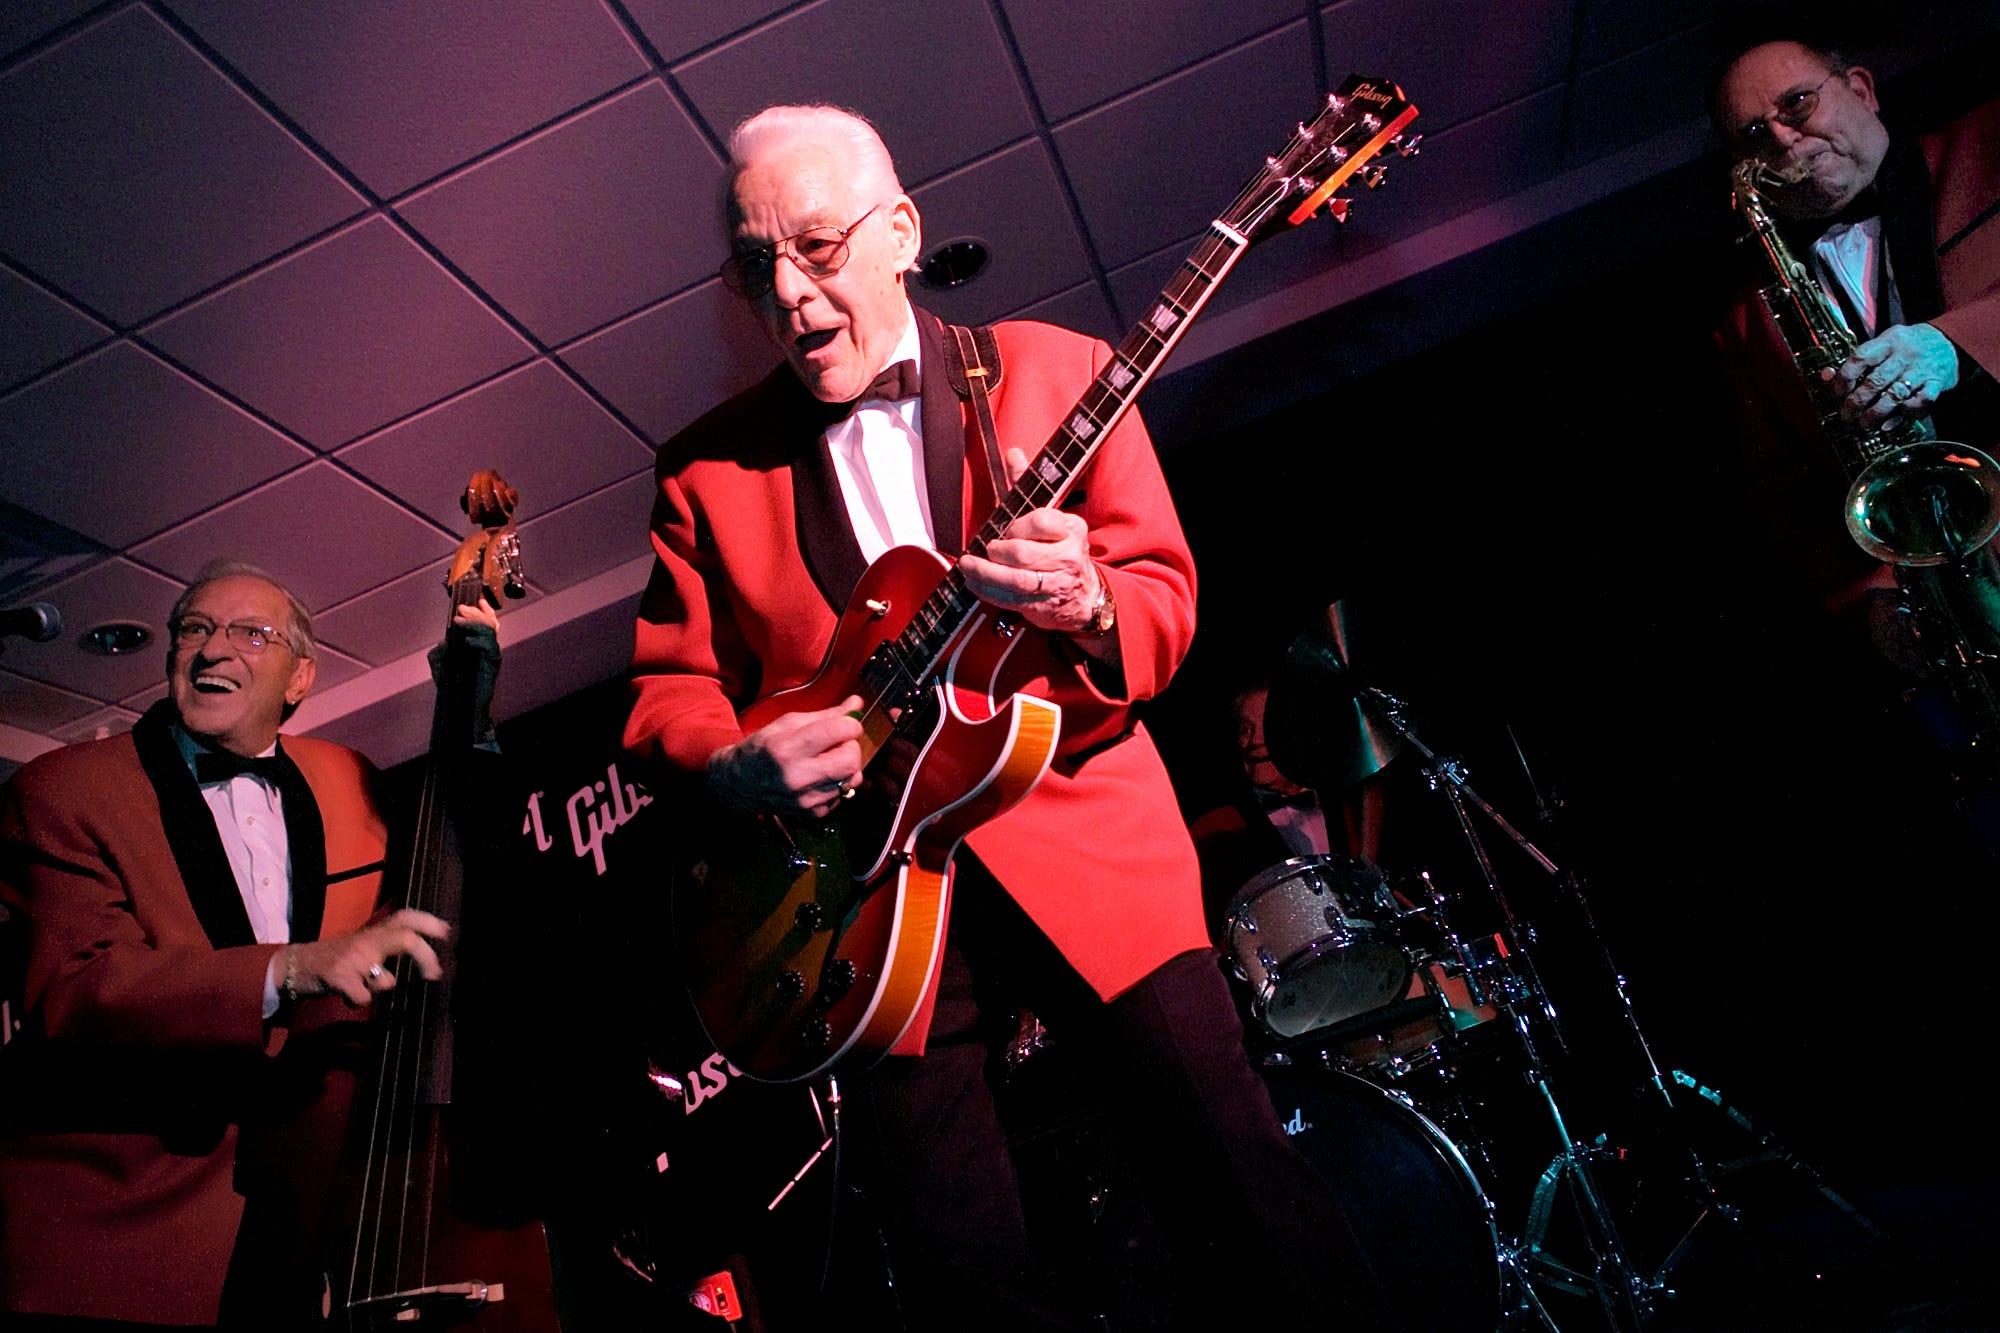 Frank Usher Rock Guitarist